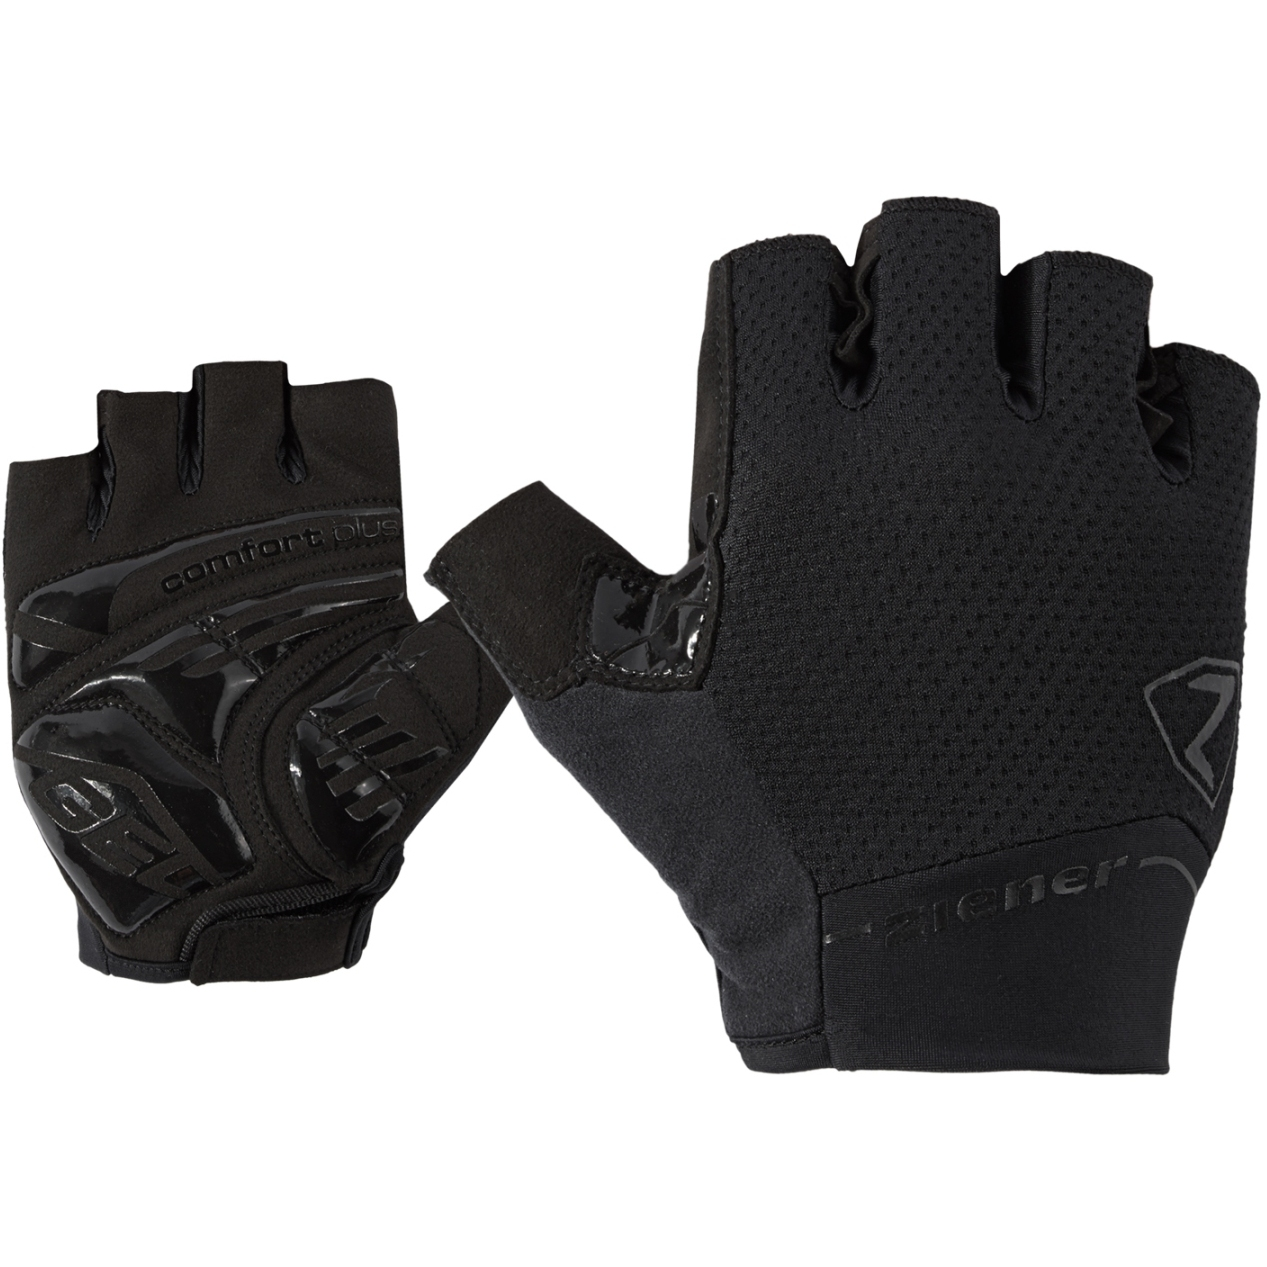 Ziener Cafar Bike Glove - black